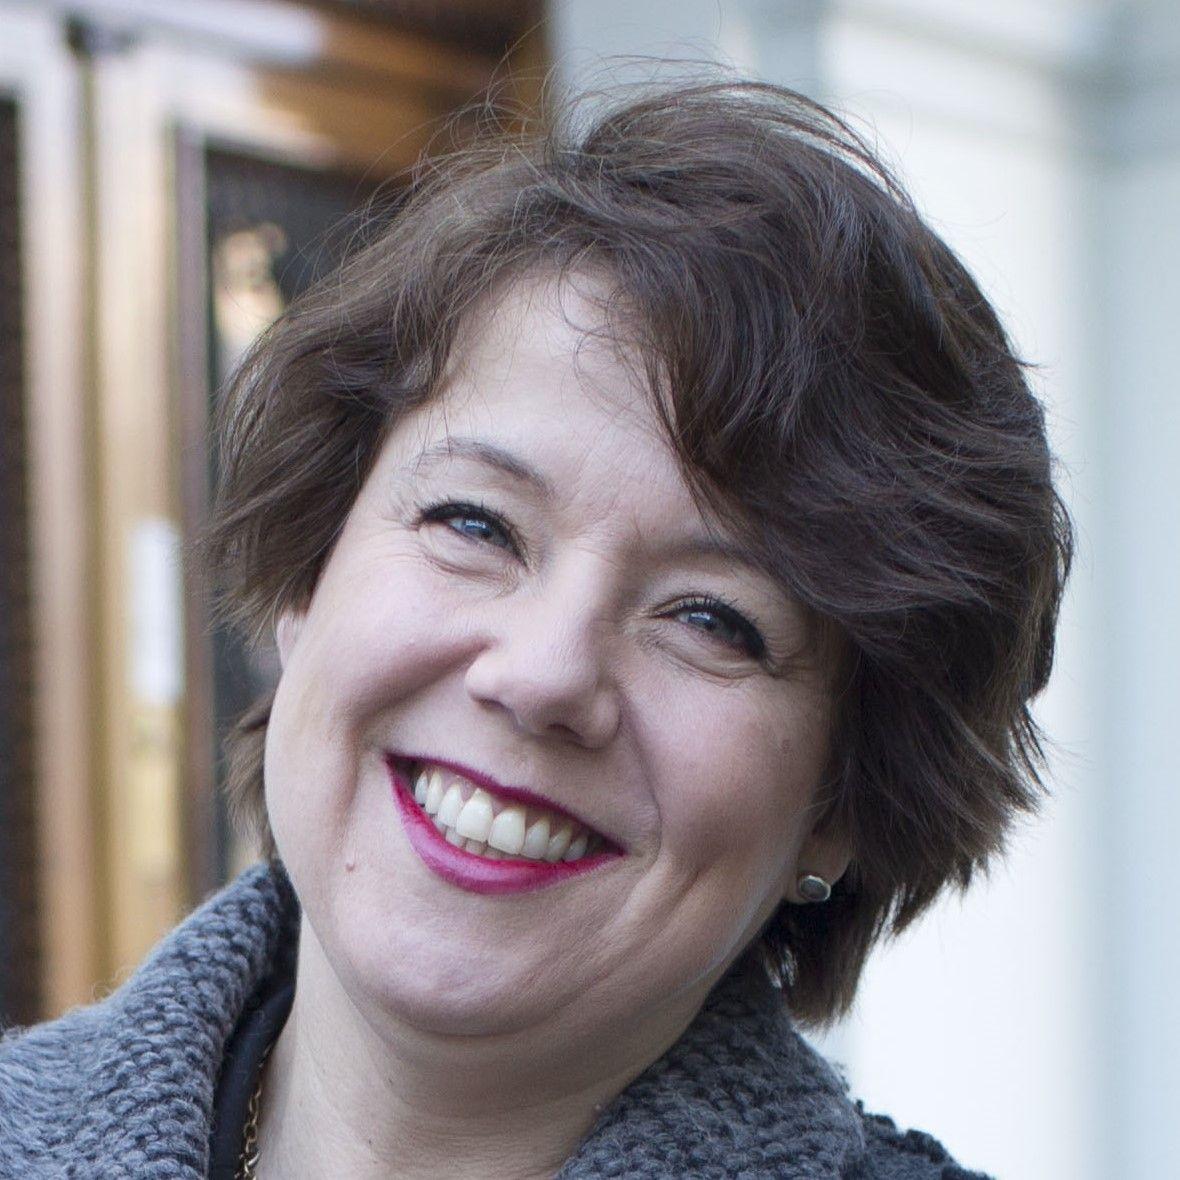 Ragnhild Sivertsen Stolt-Nielsen